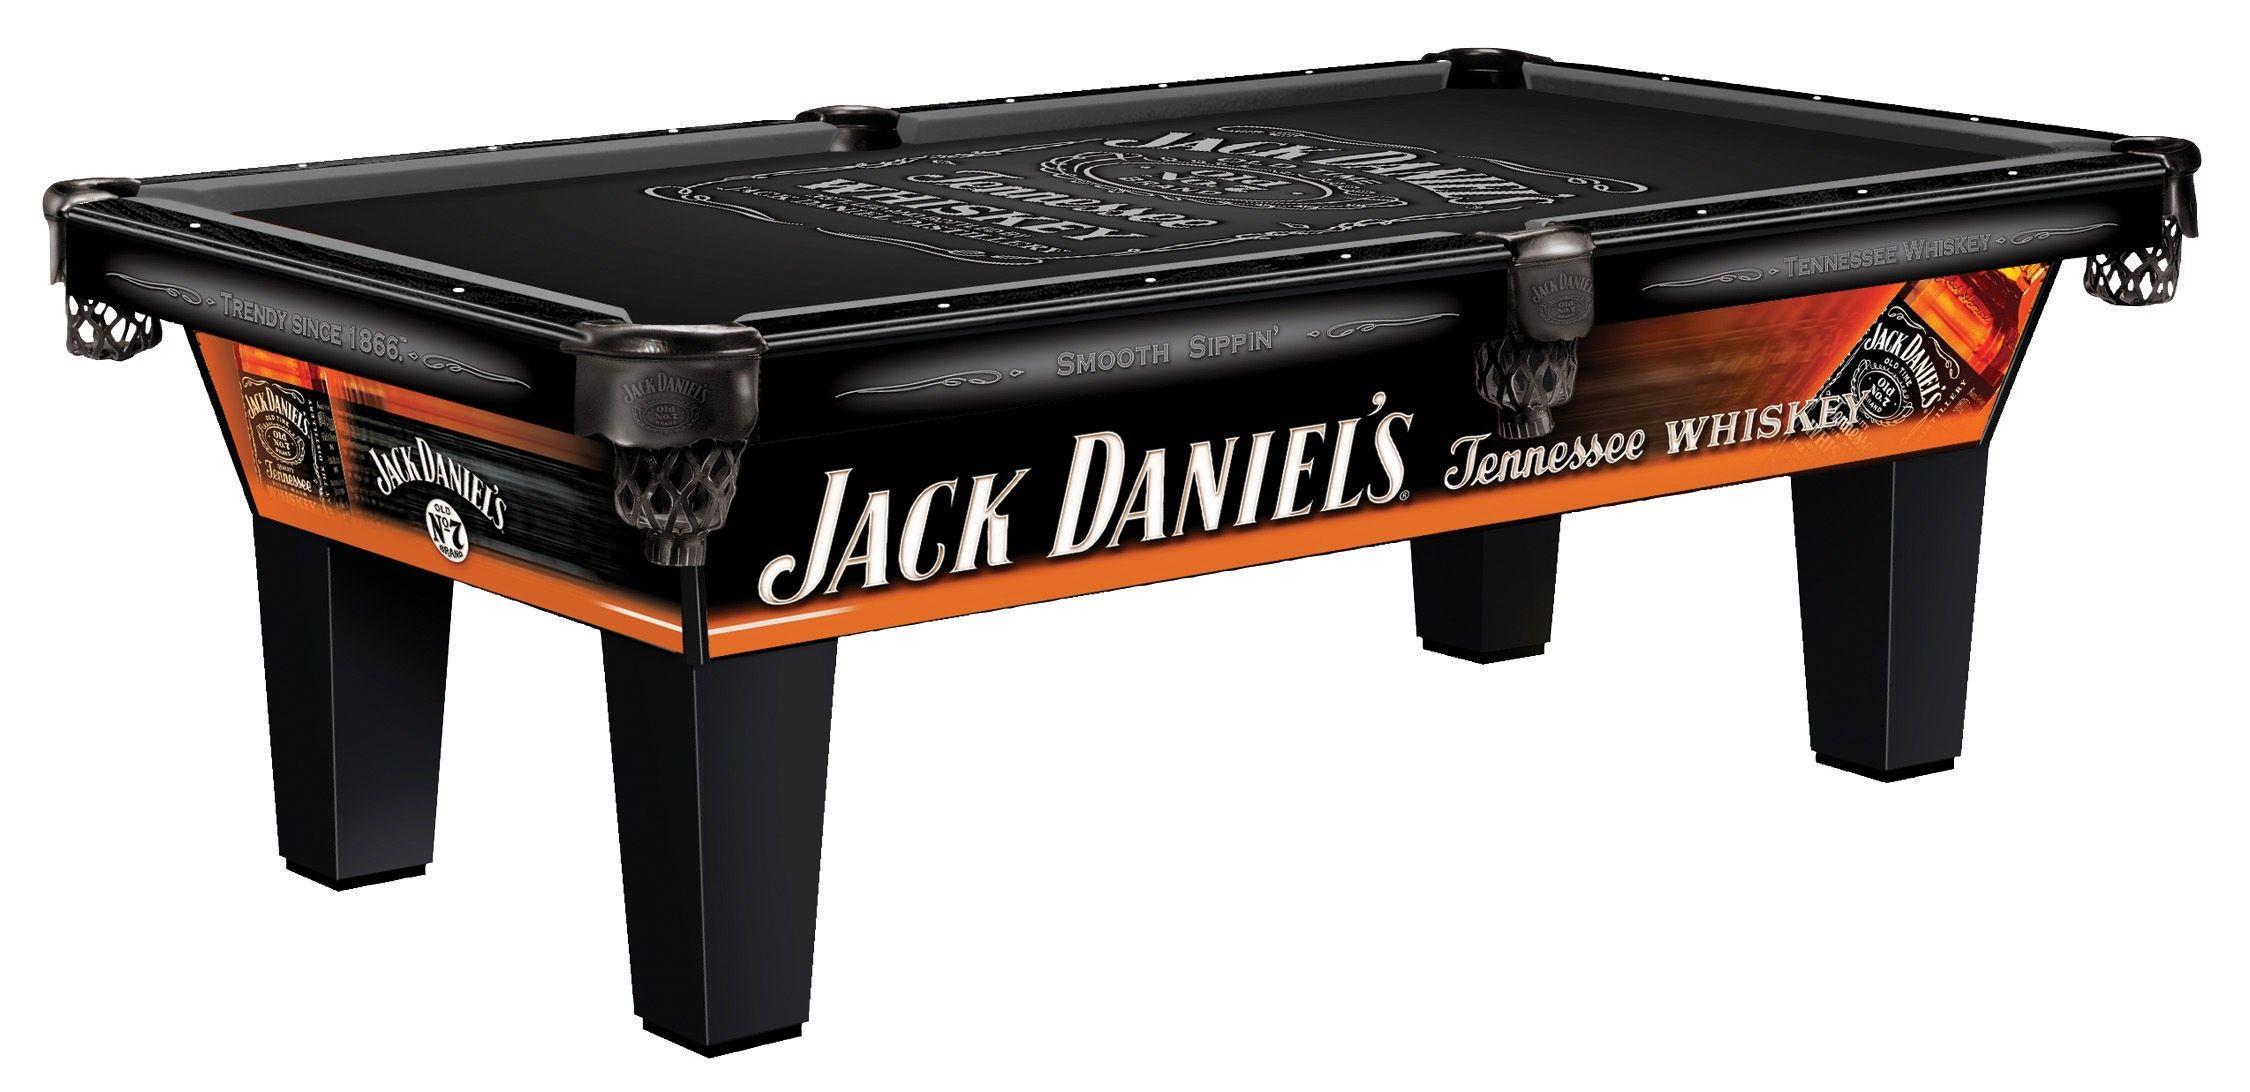 Triangle Billiards and Barstools Pool table, Jack daniel